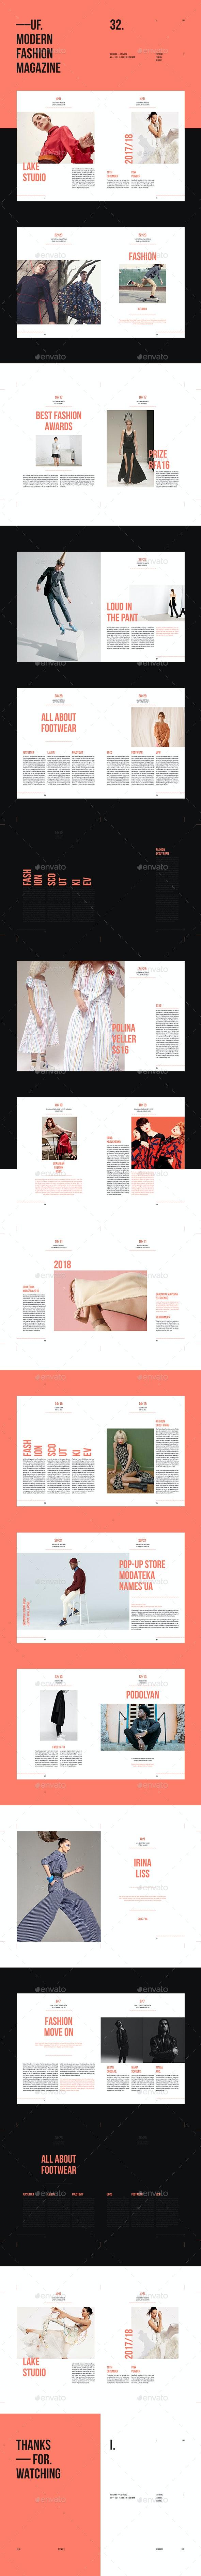 UF — Fashion Brochure Template - Brochures Print Templates